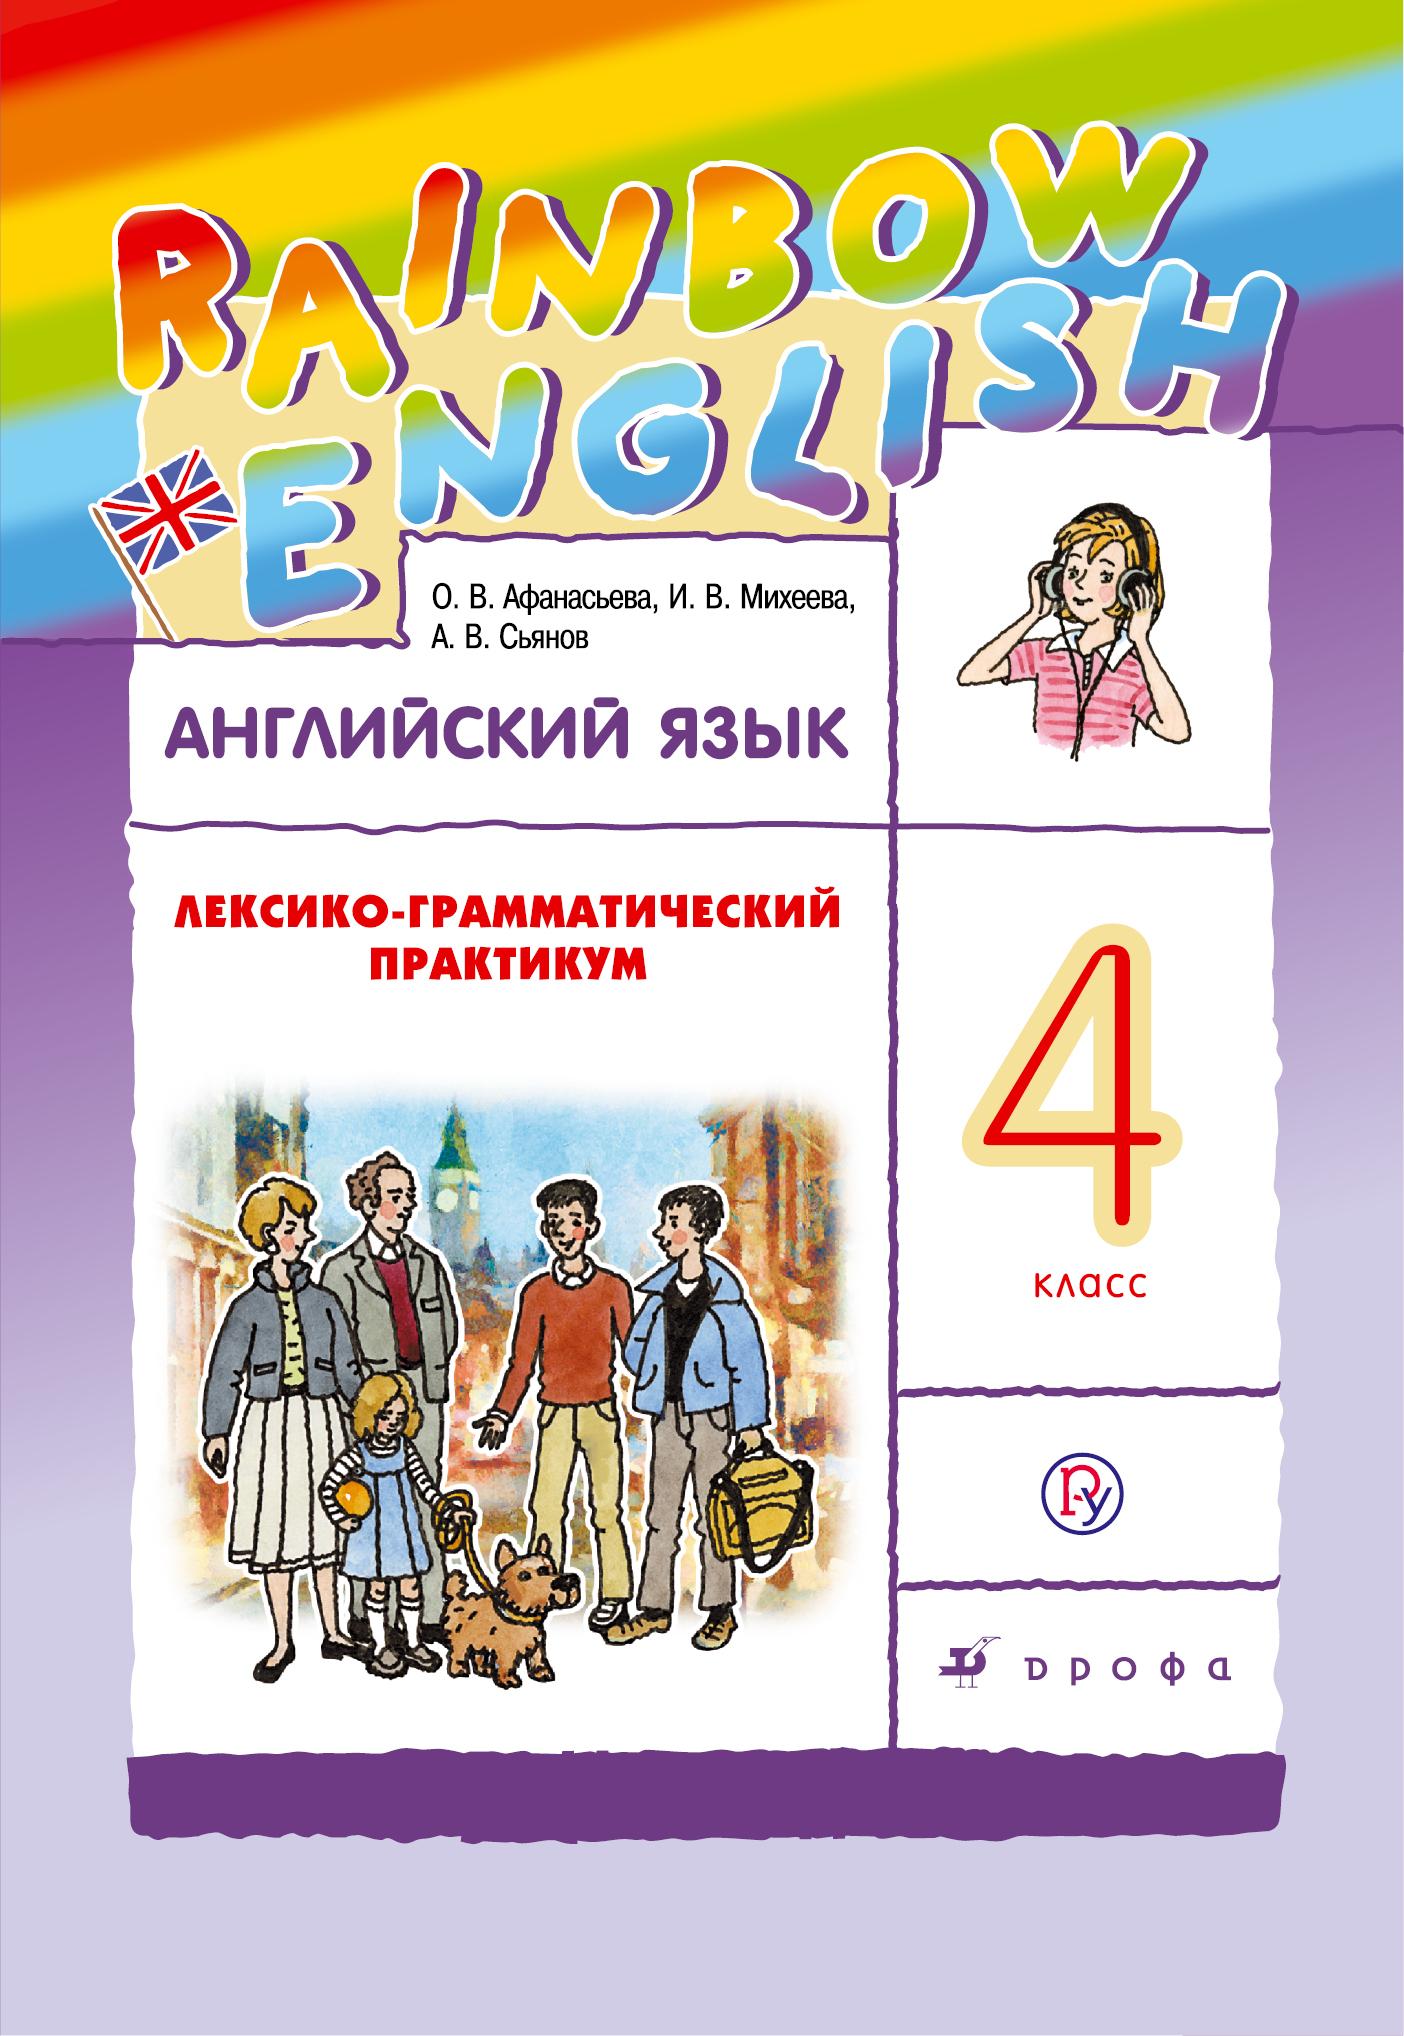 Афанасьева Михеева Английский язык 4 кл. Лексико-грамматический практикум РИТМ